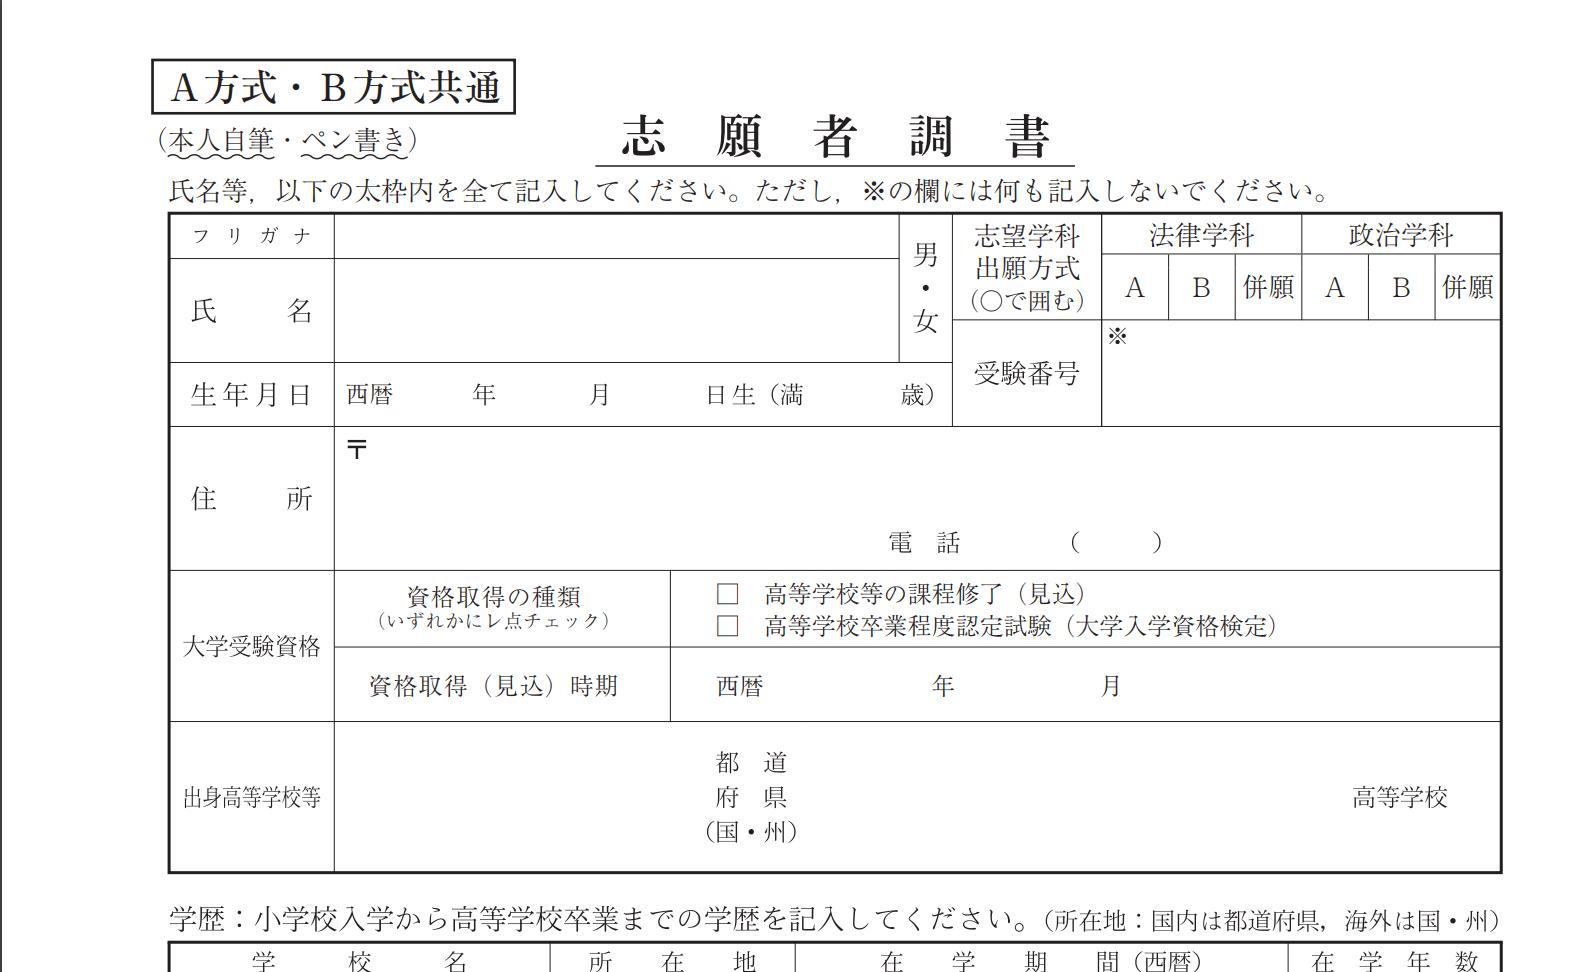 慶應法FIT入試志願者調書